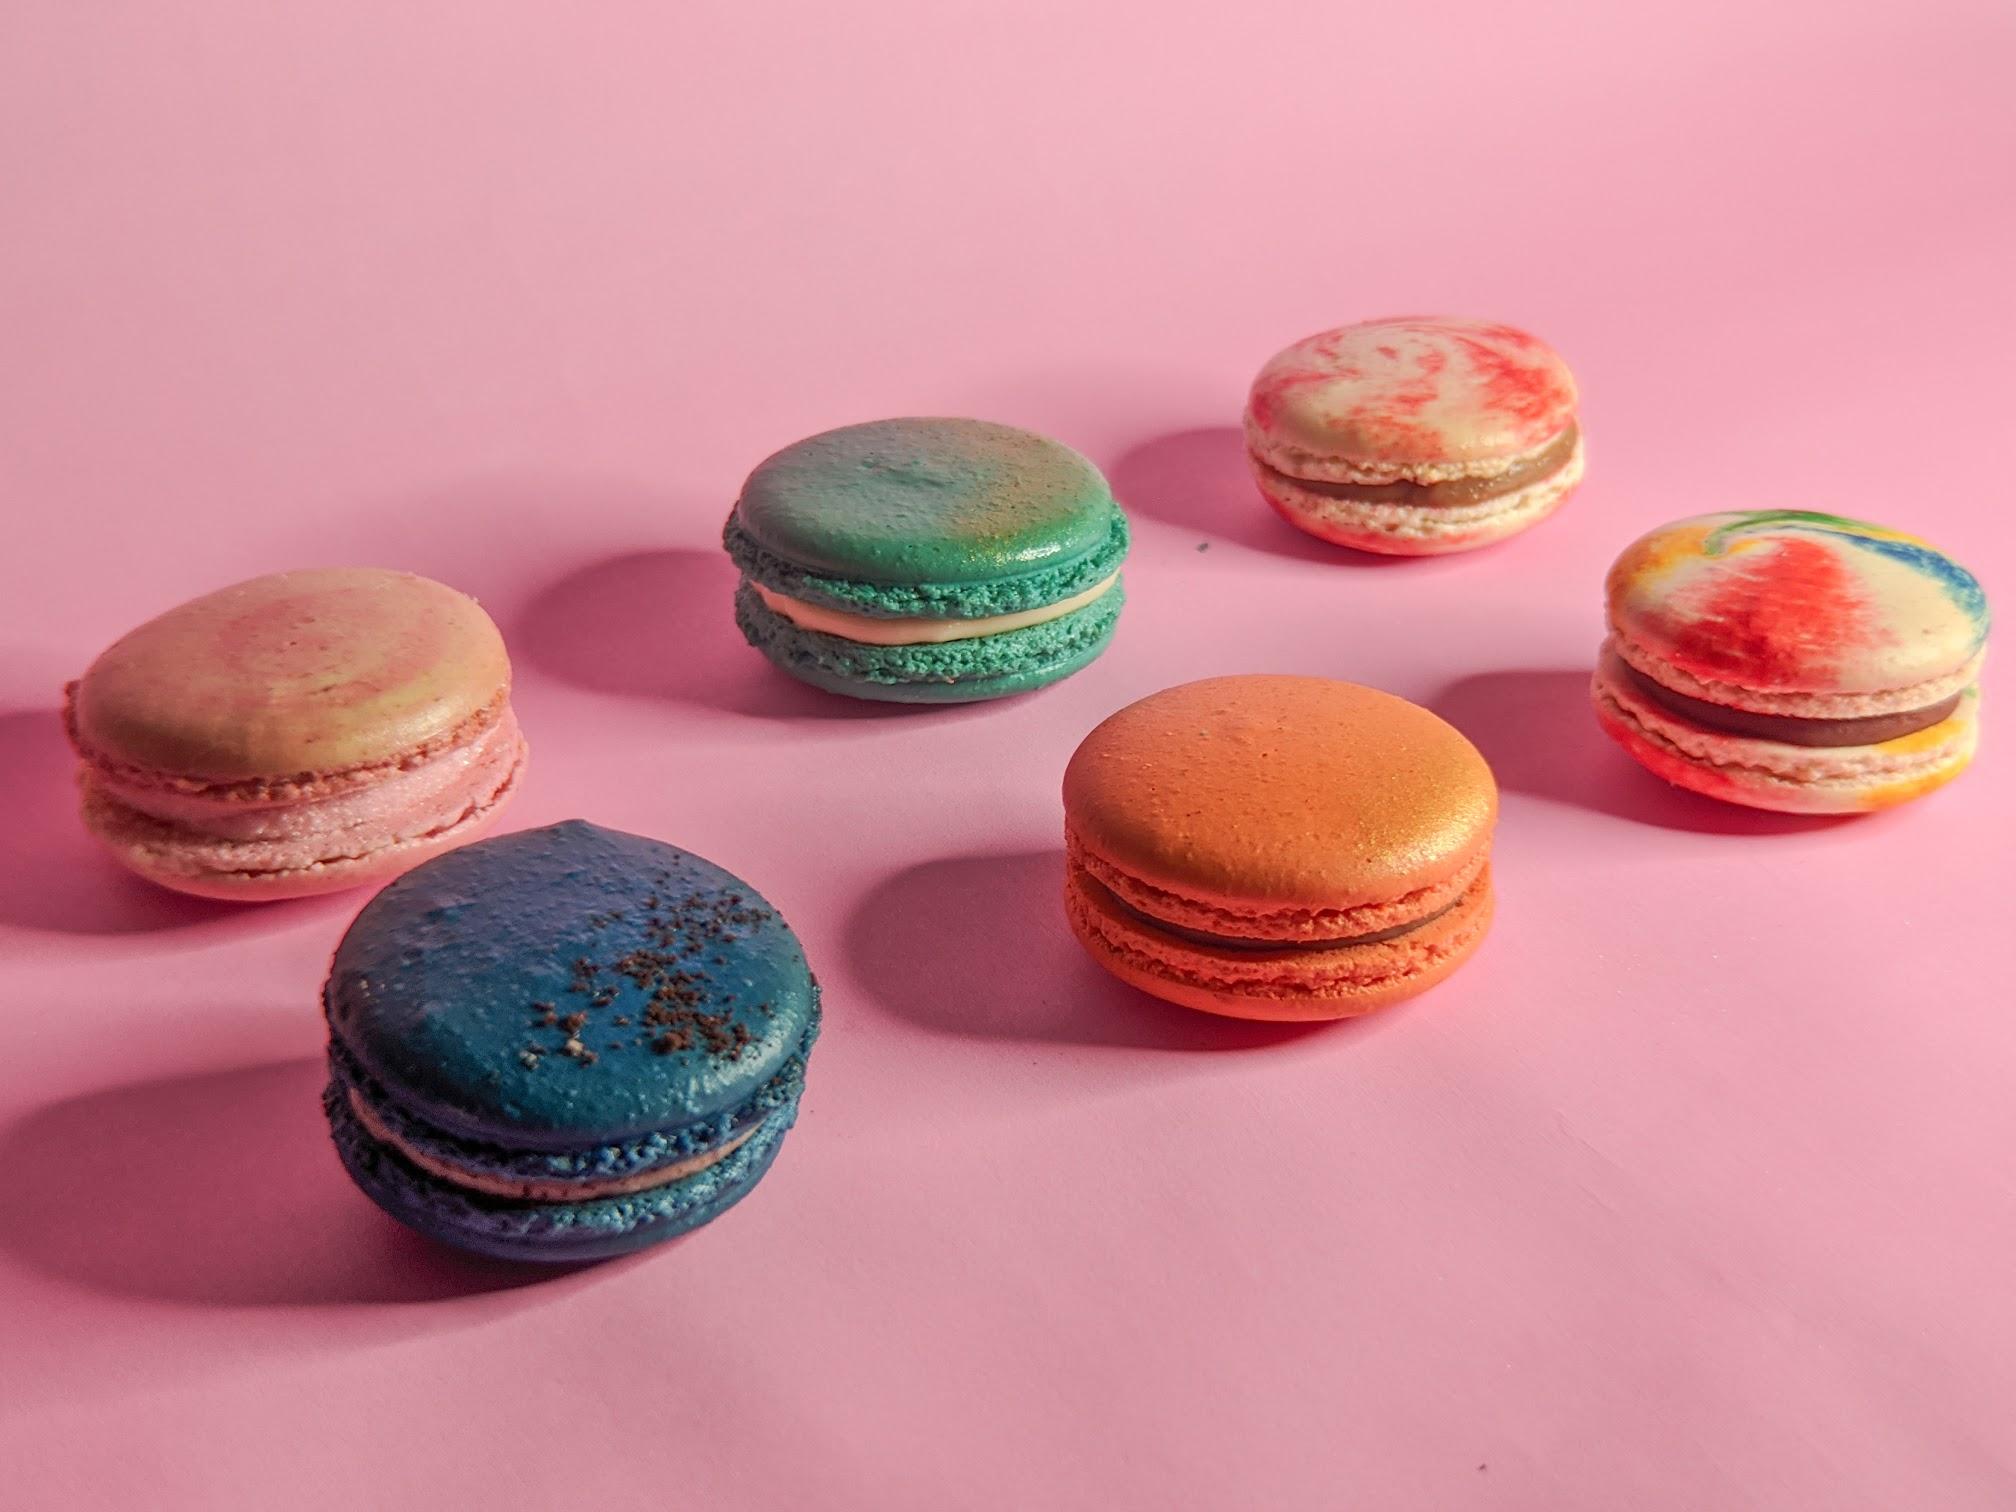 Culinary arts career - macarons